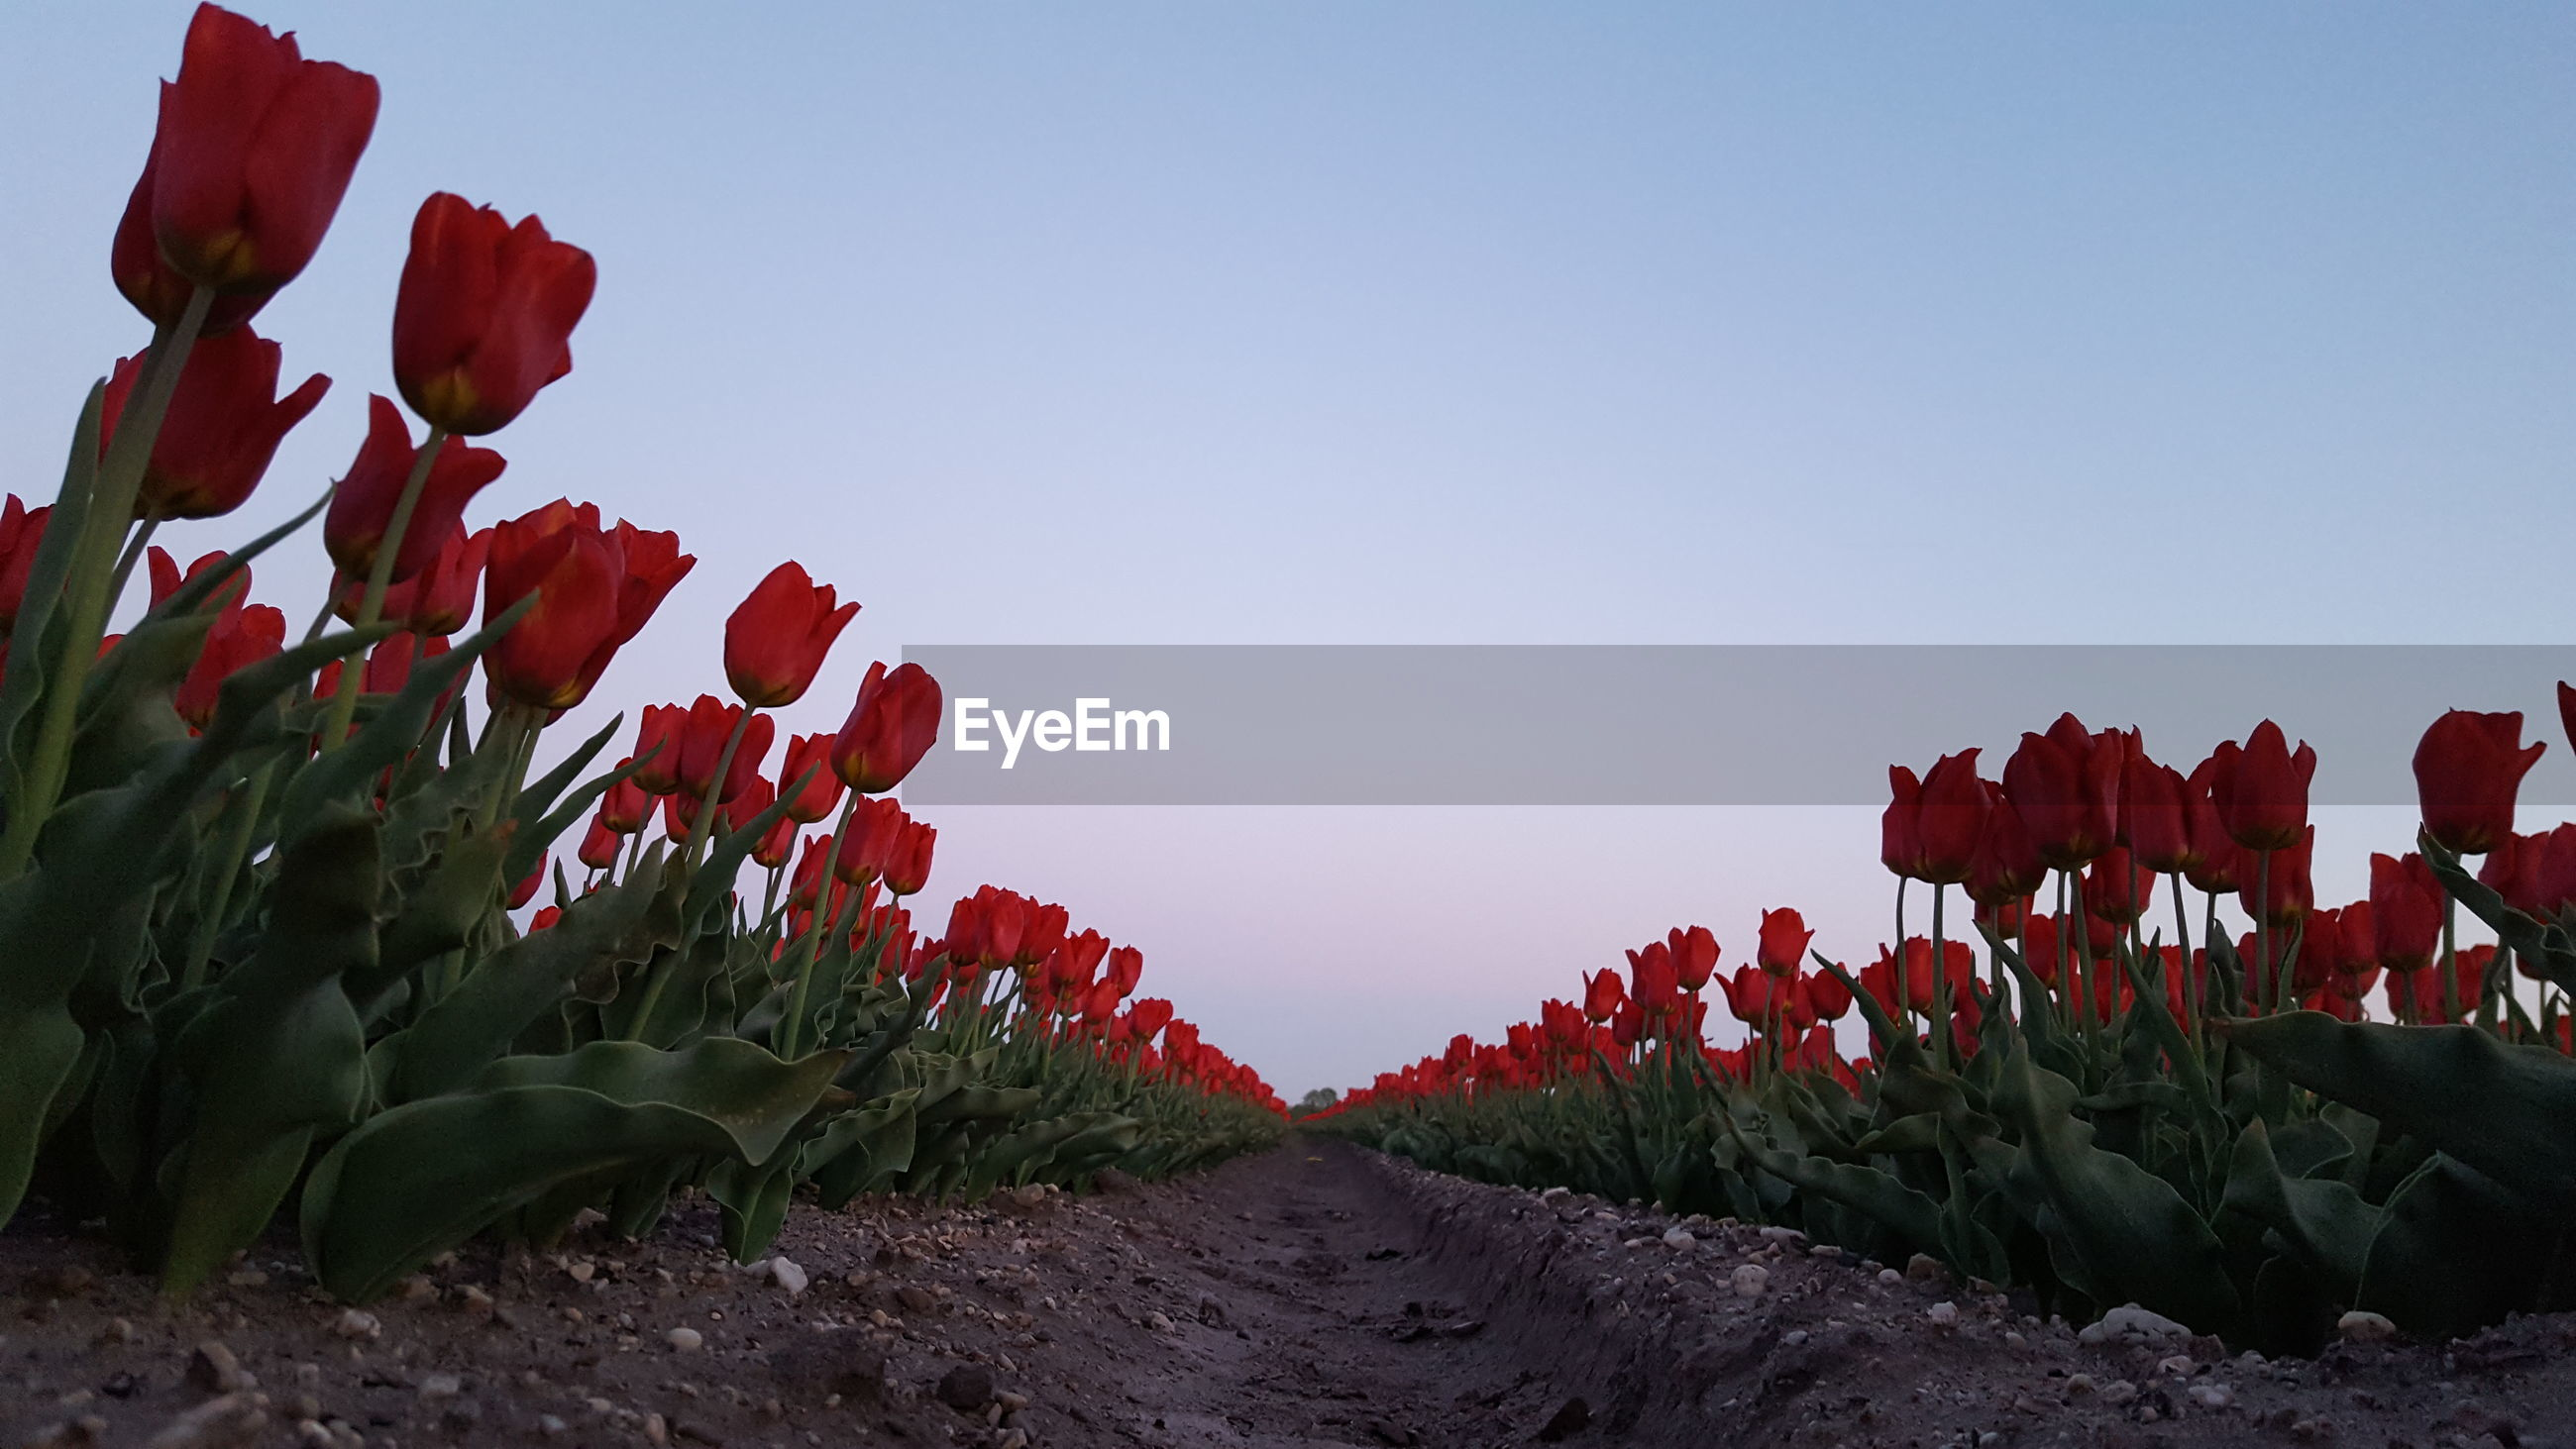 RED FLOWERING PLANTS ON LAND AGAINST SKY